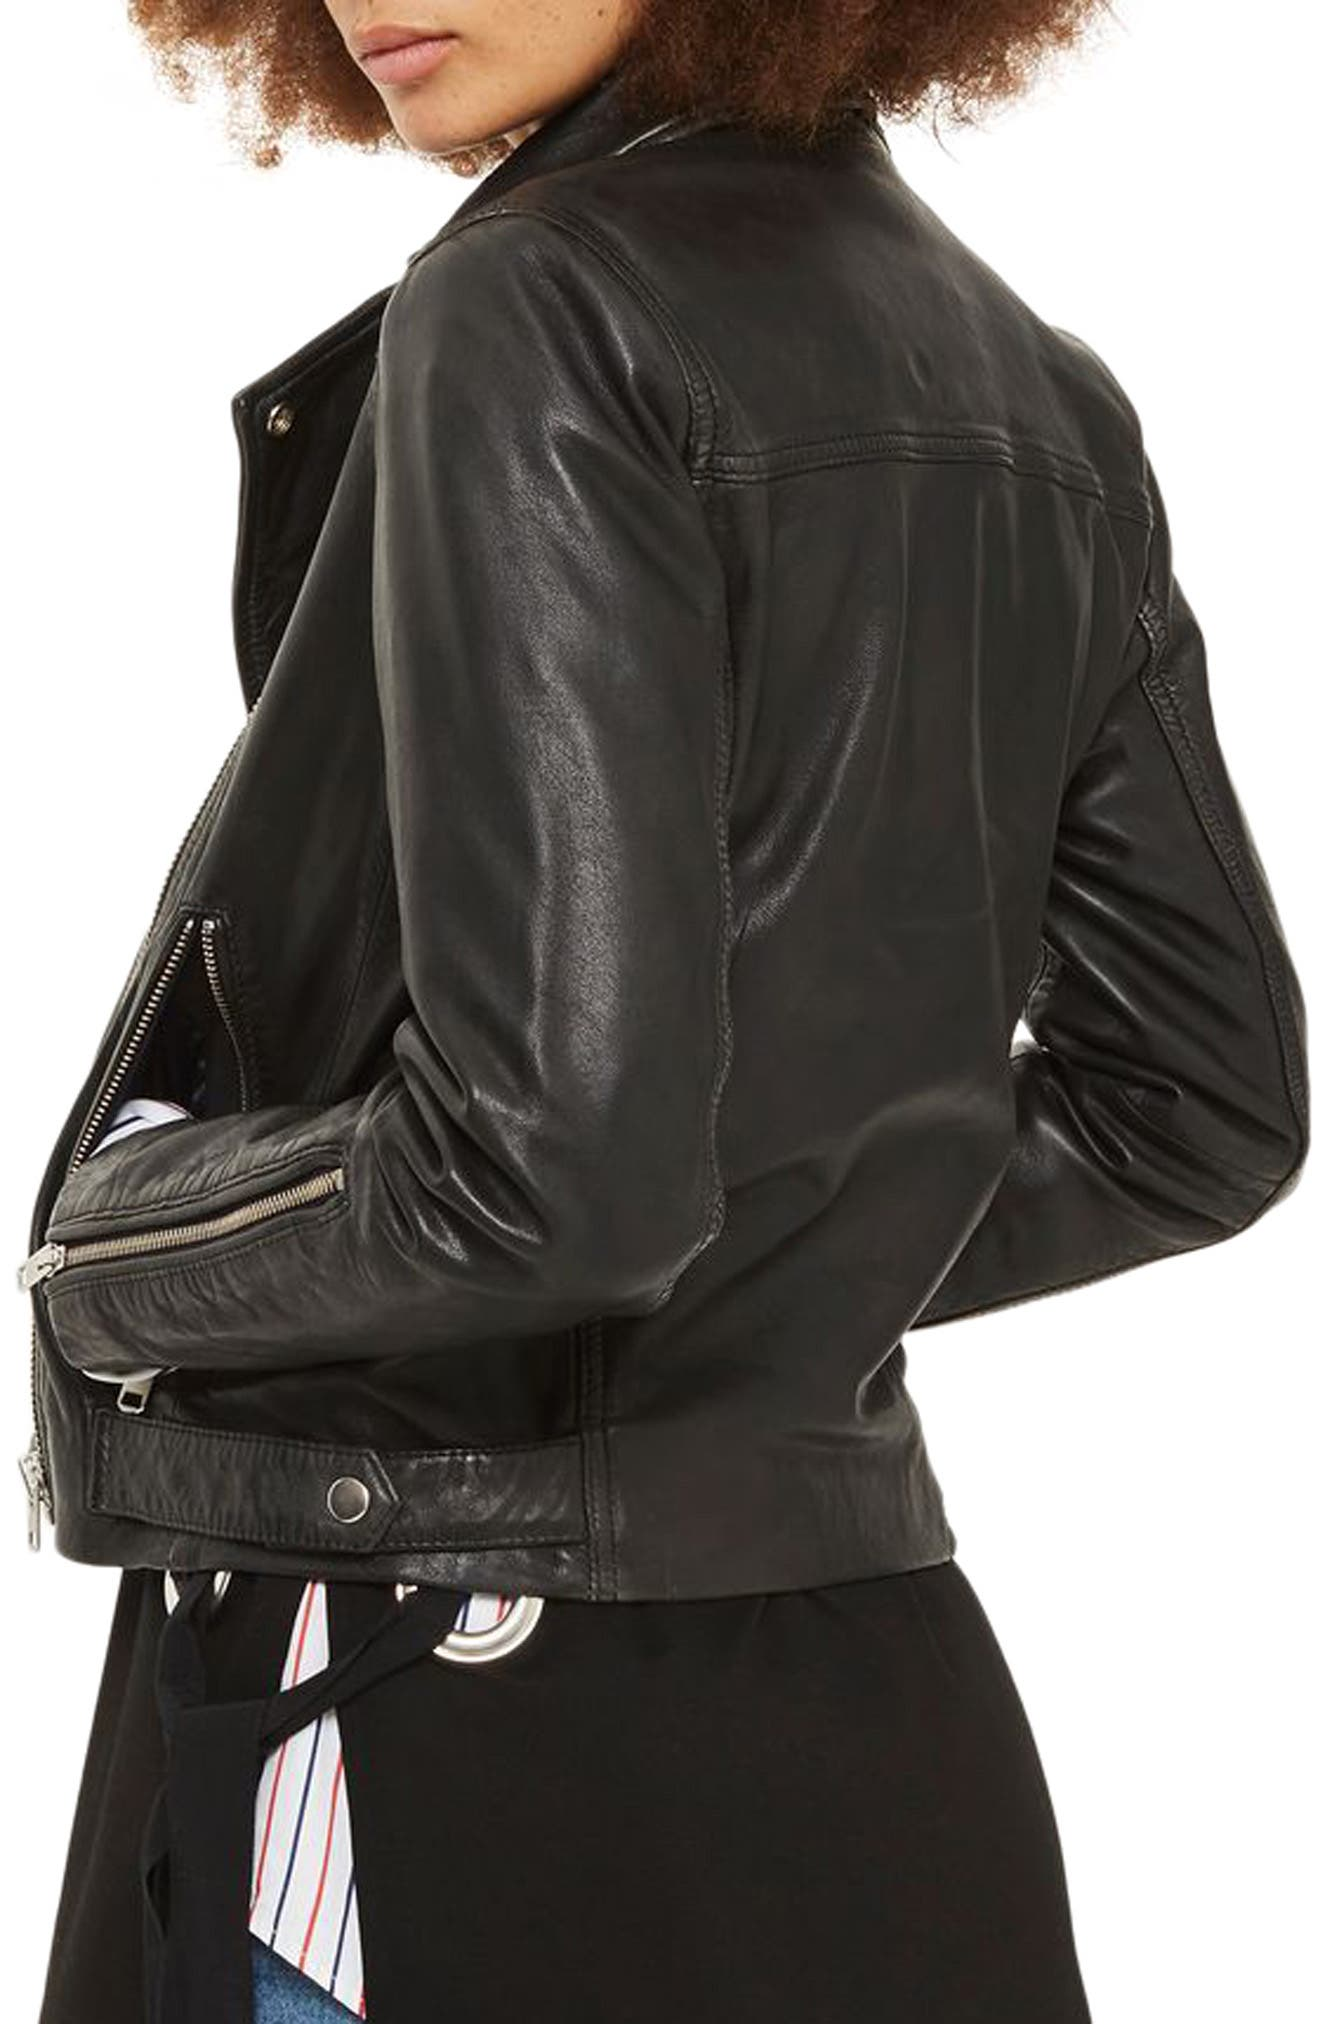 Lucky Leather Biker Jacket,                             Alternate thumbnail 2, color,                             Black